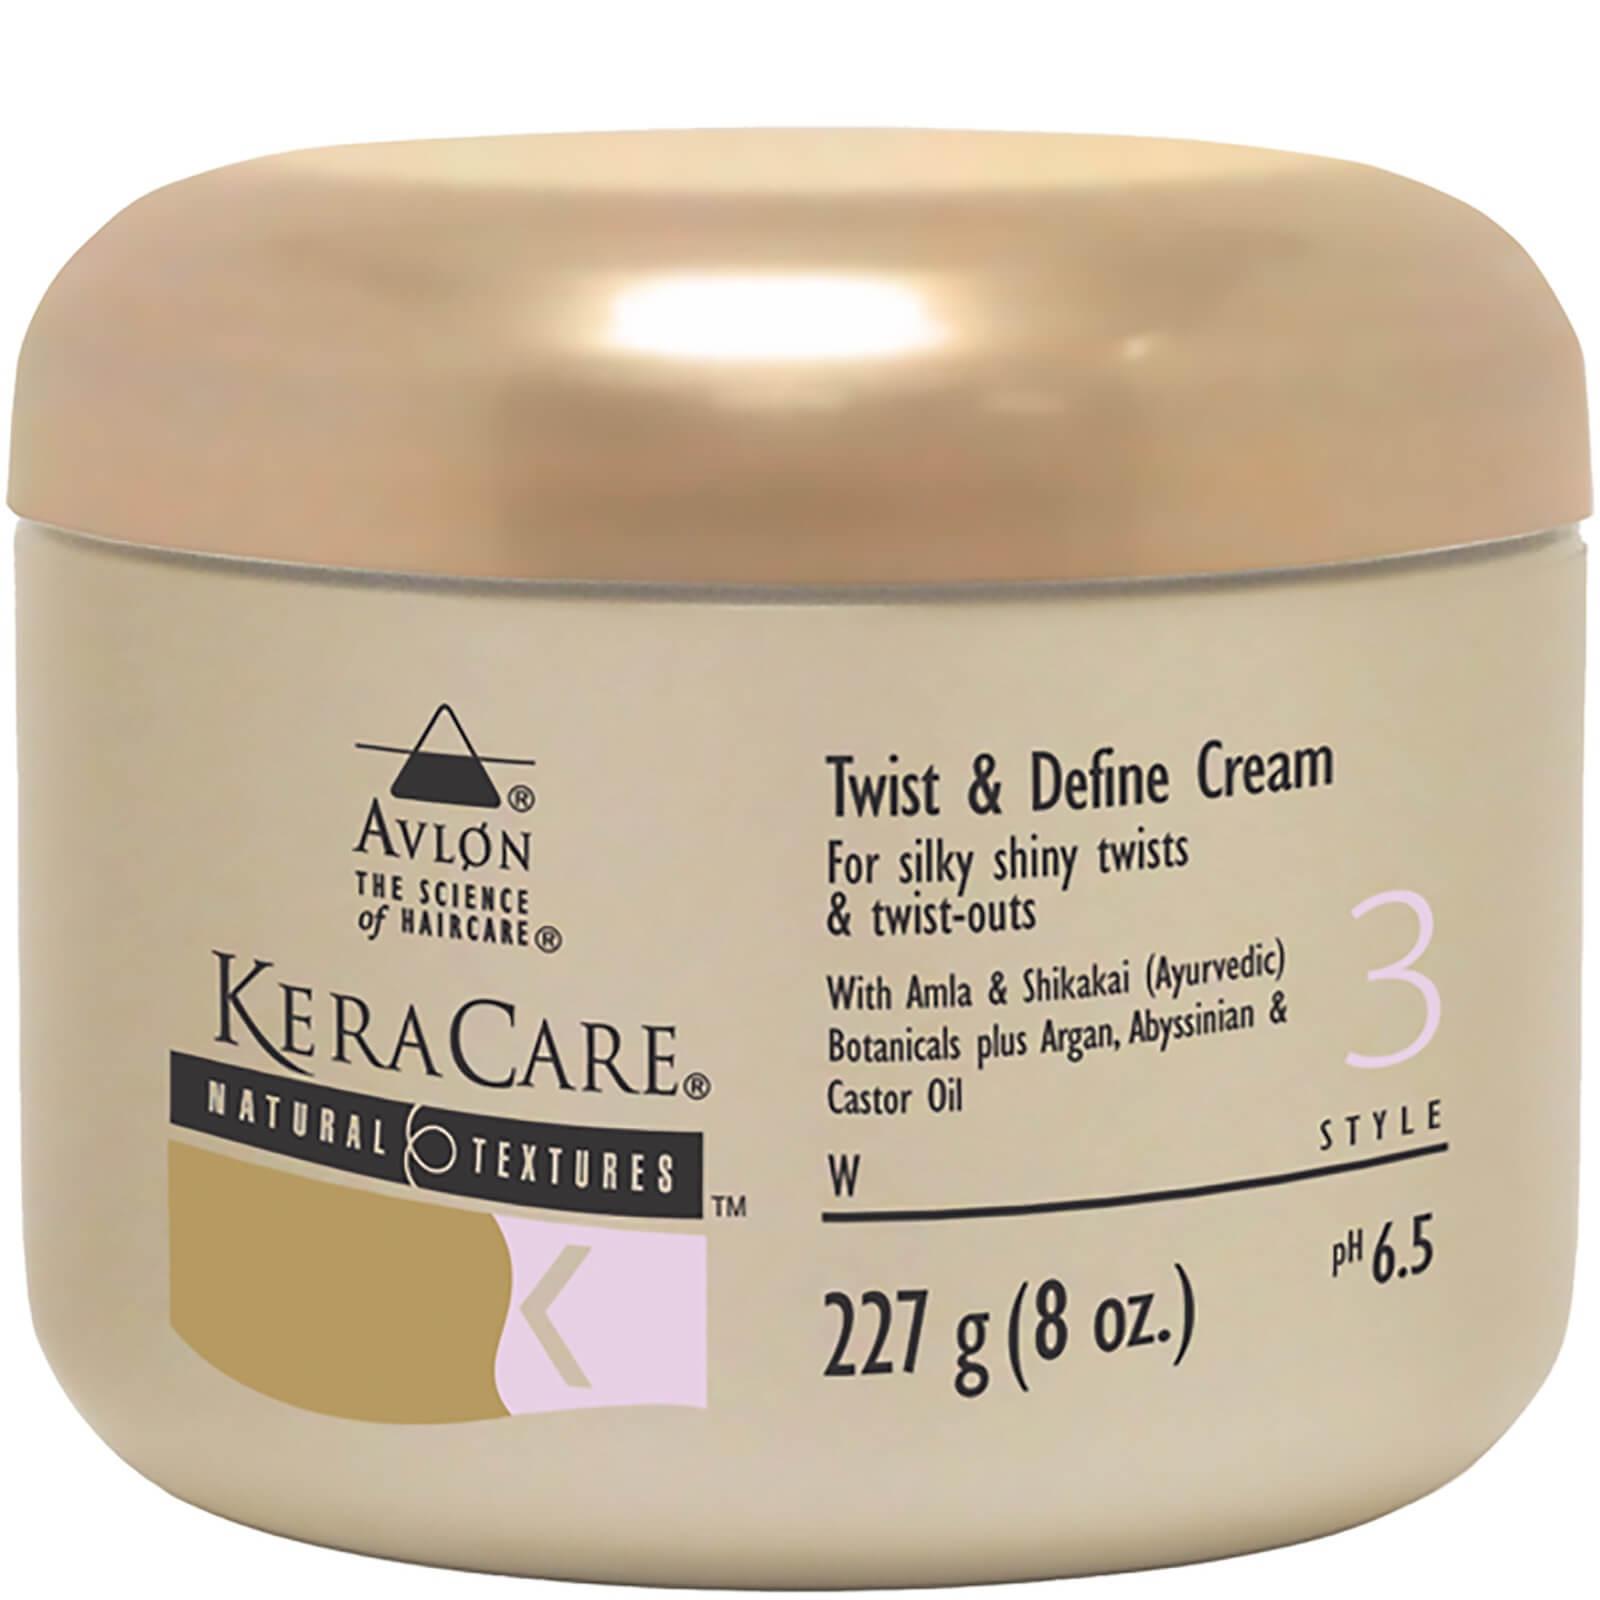 KeraCare Natural Textures Twist & Define Cream (8 oz )